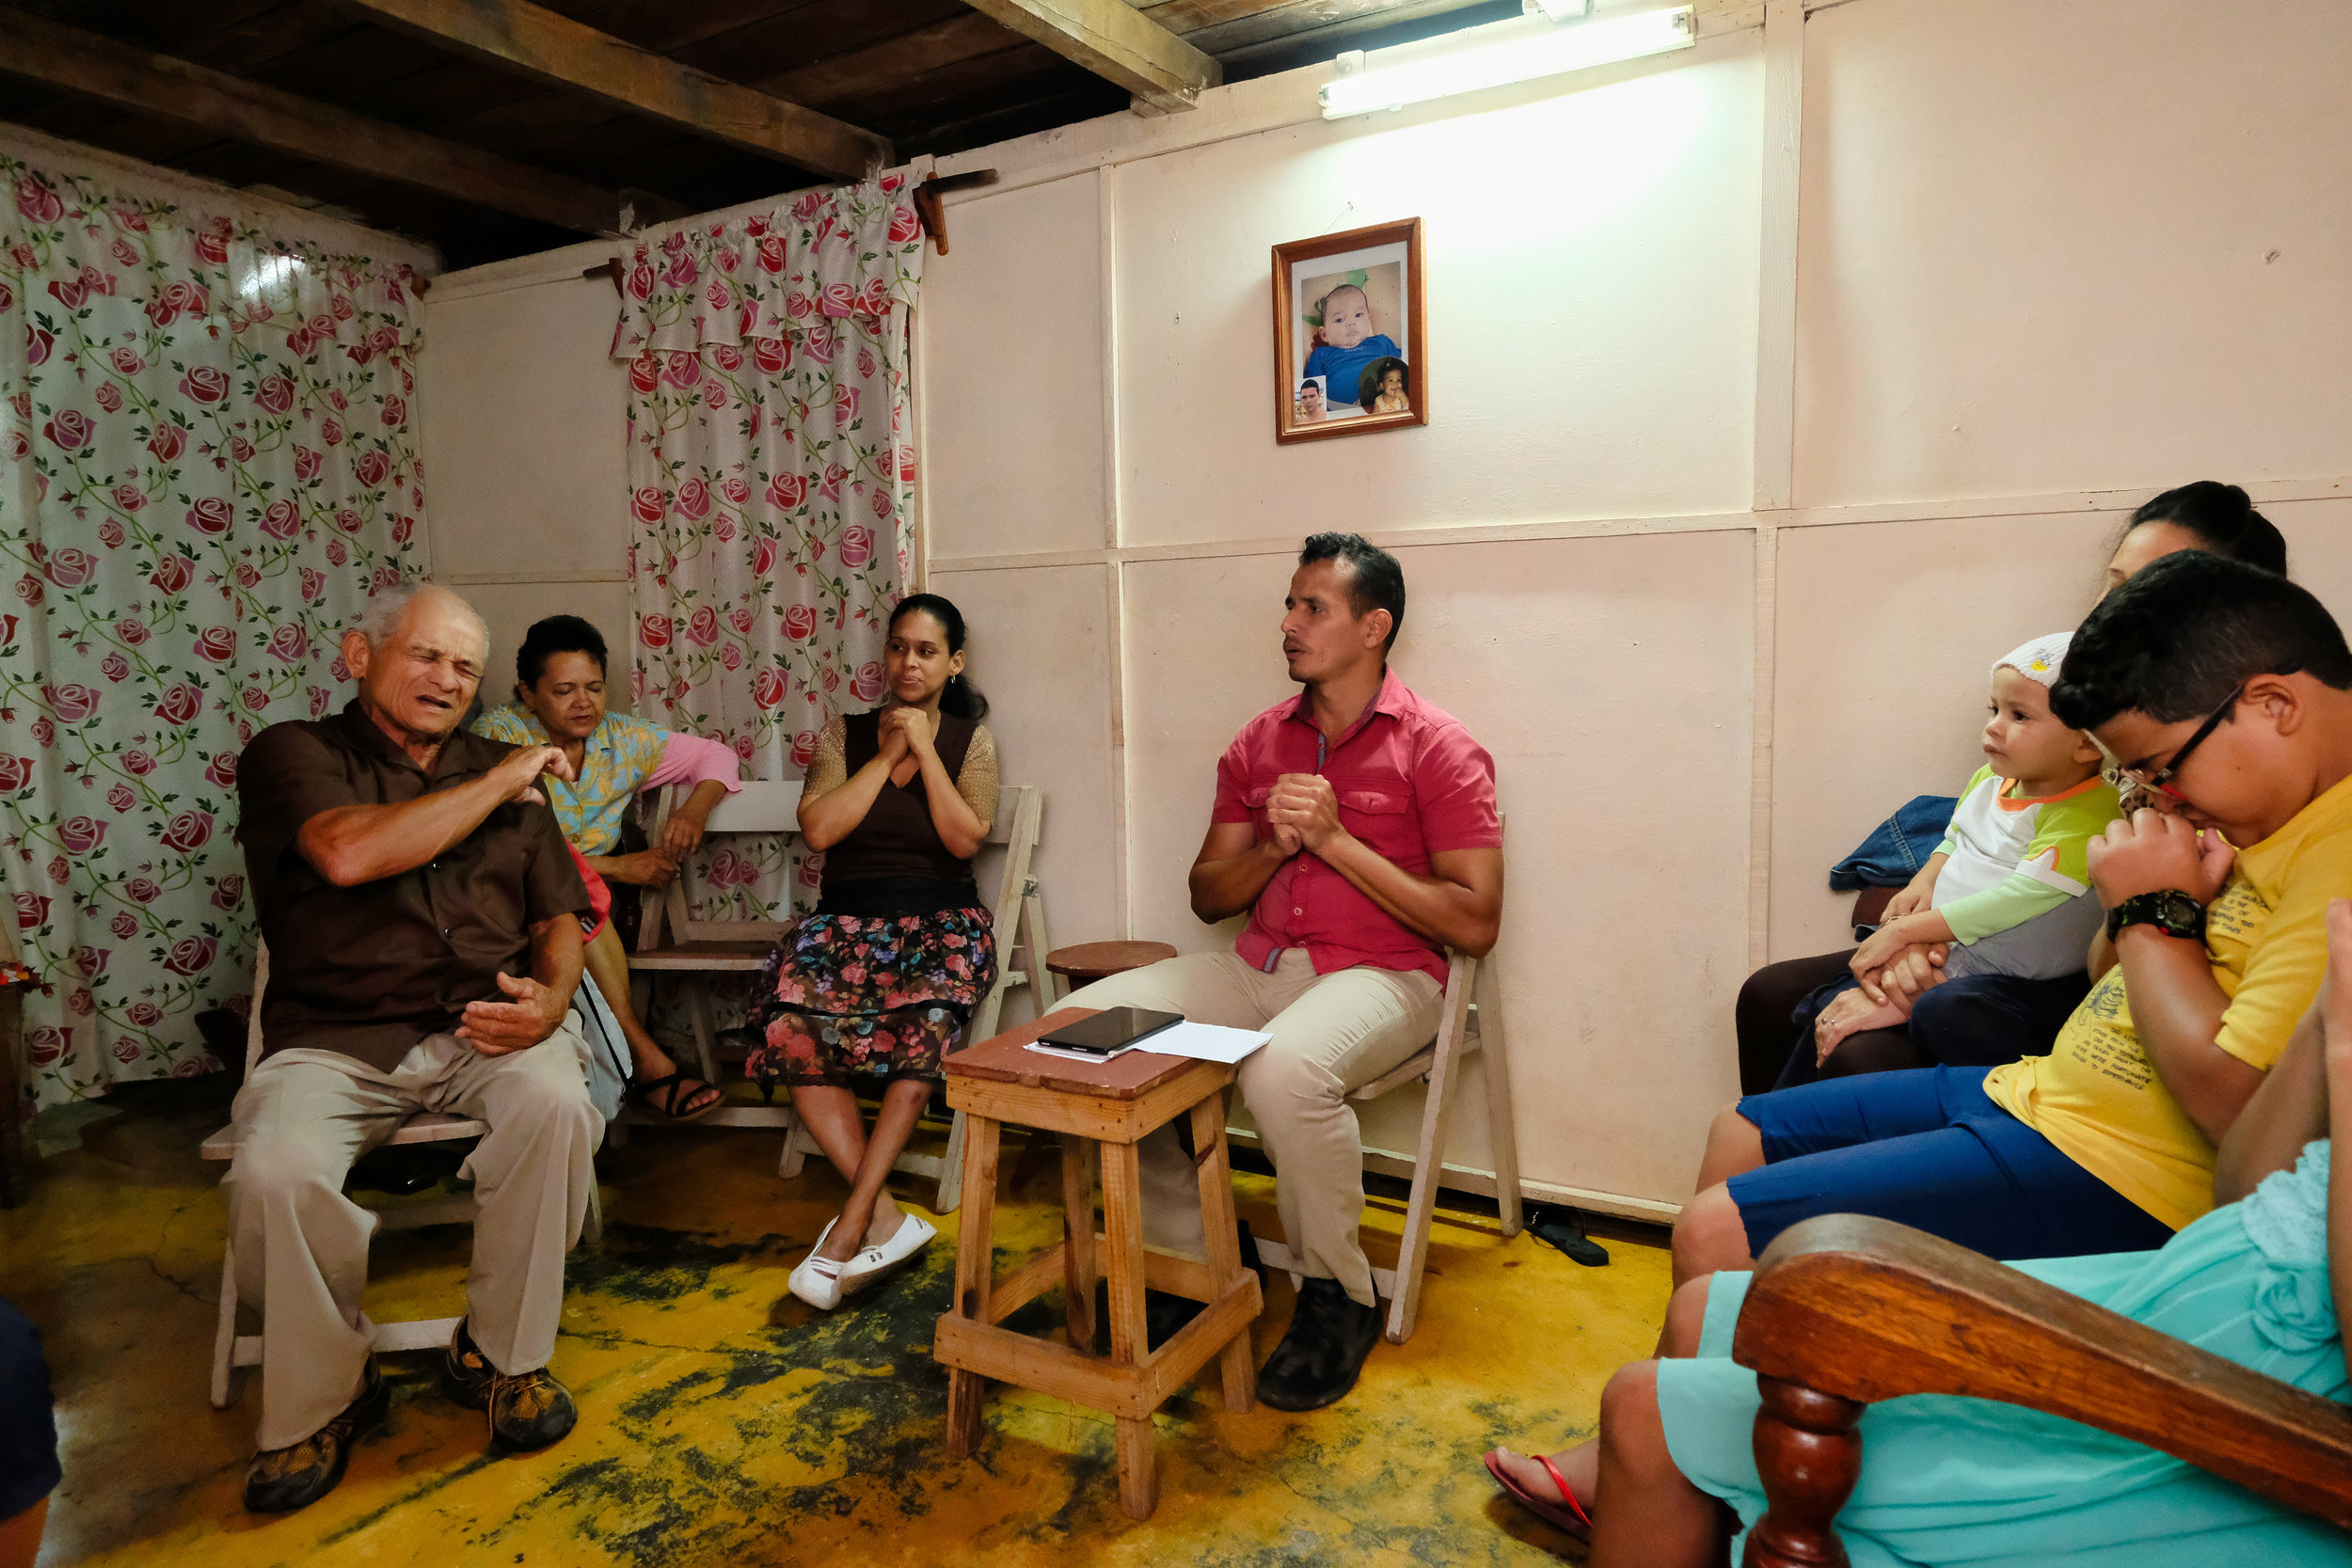 Tuesday night Deaf prayer meeting